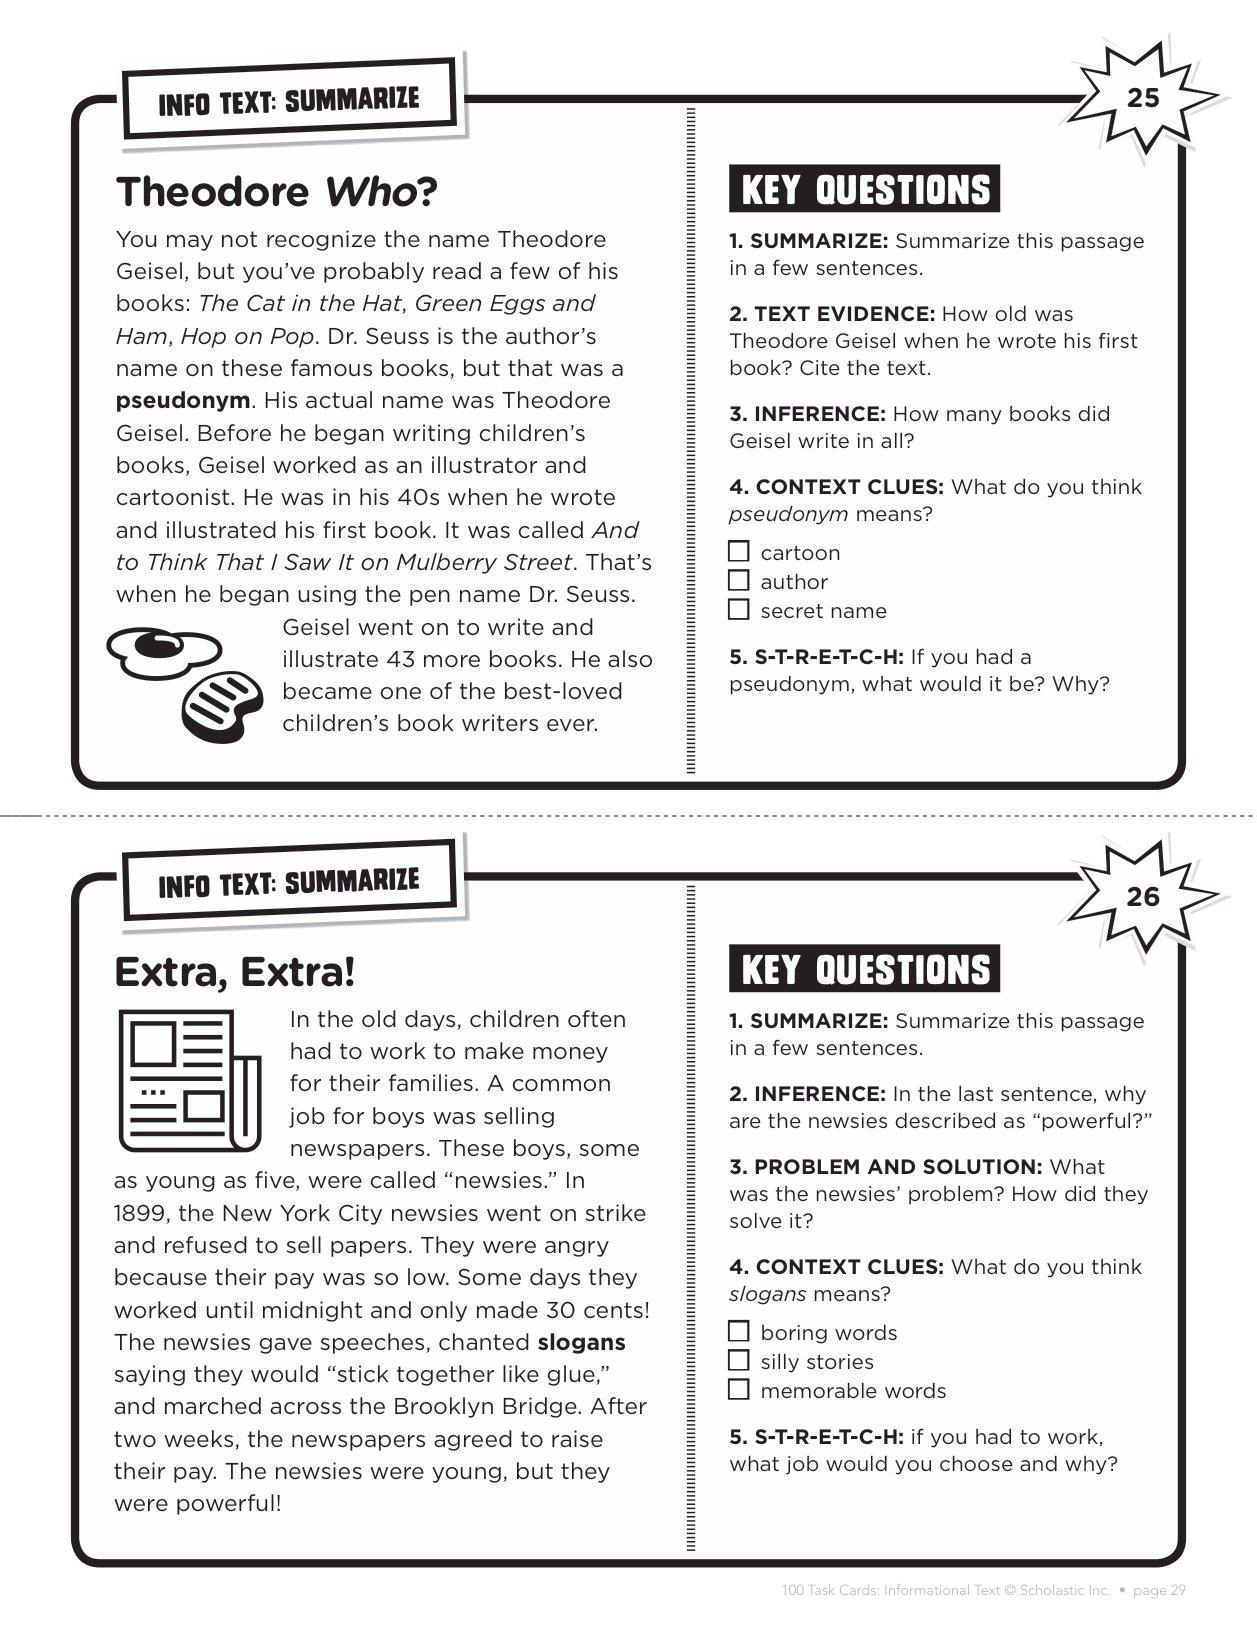 Amazon com: 100 Task Cards: Informational Text: Reproducible